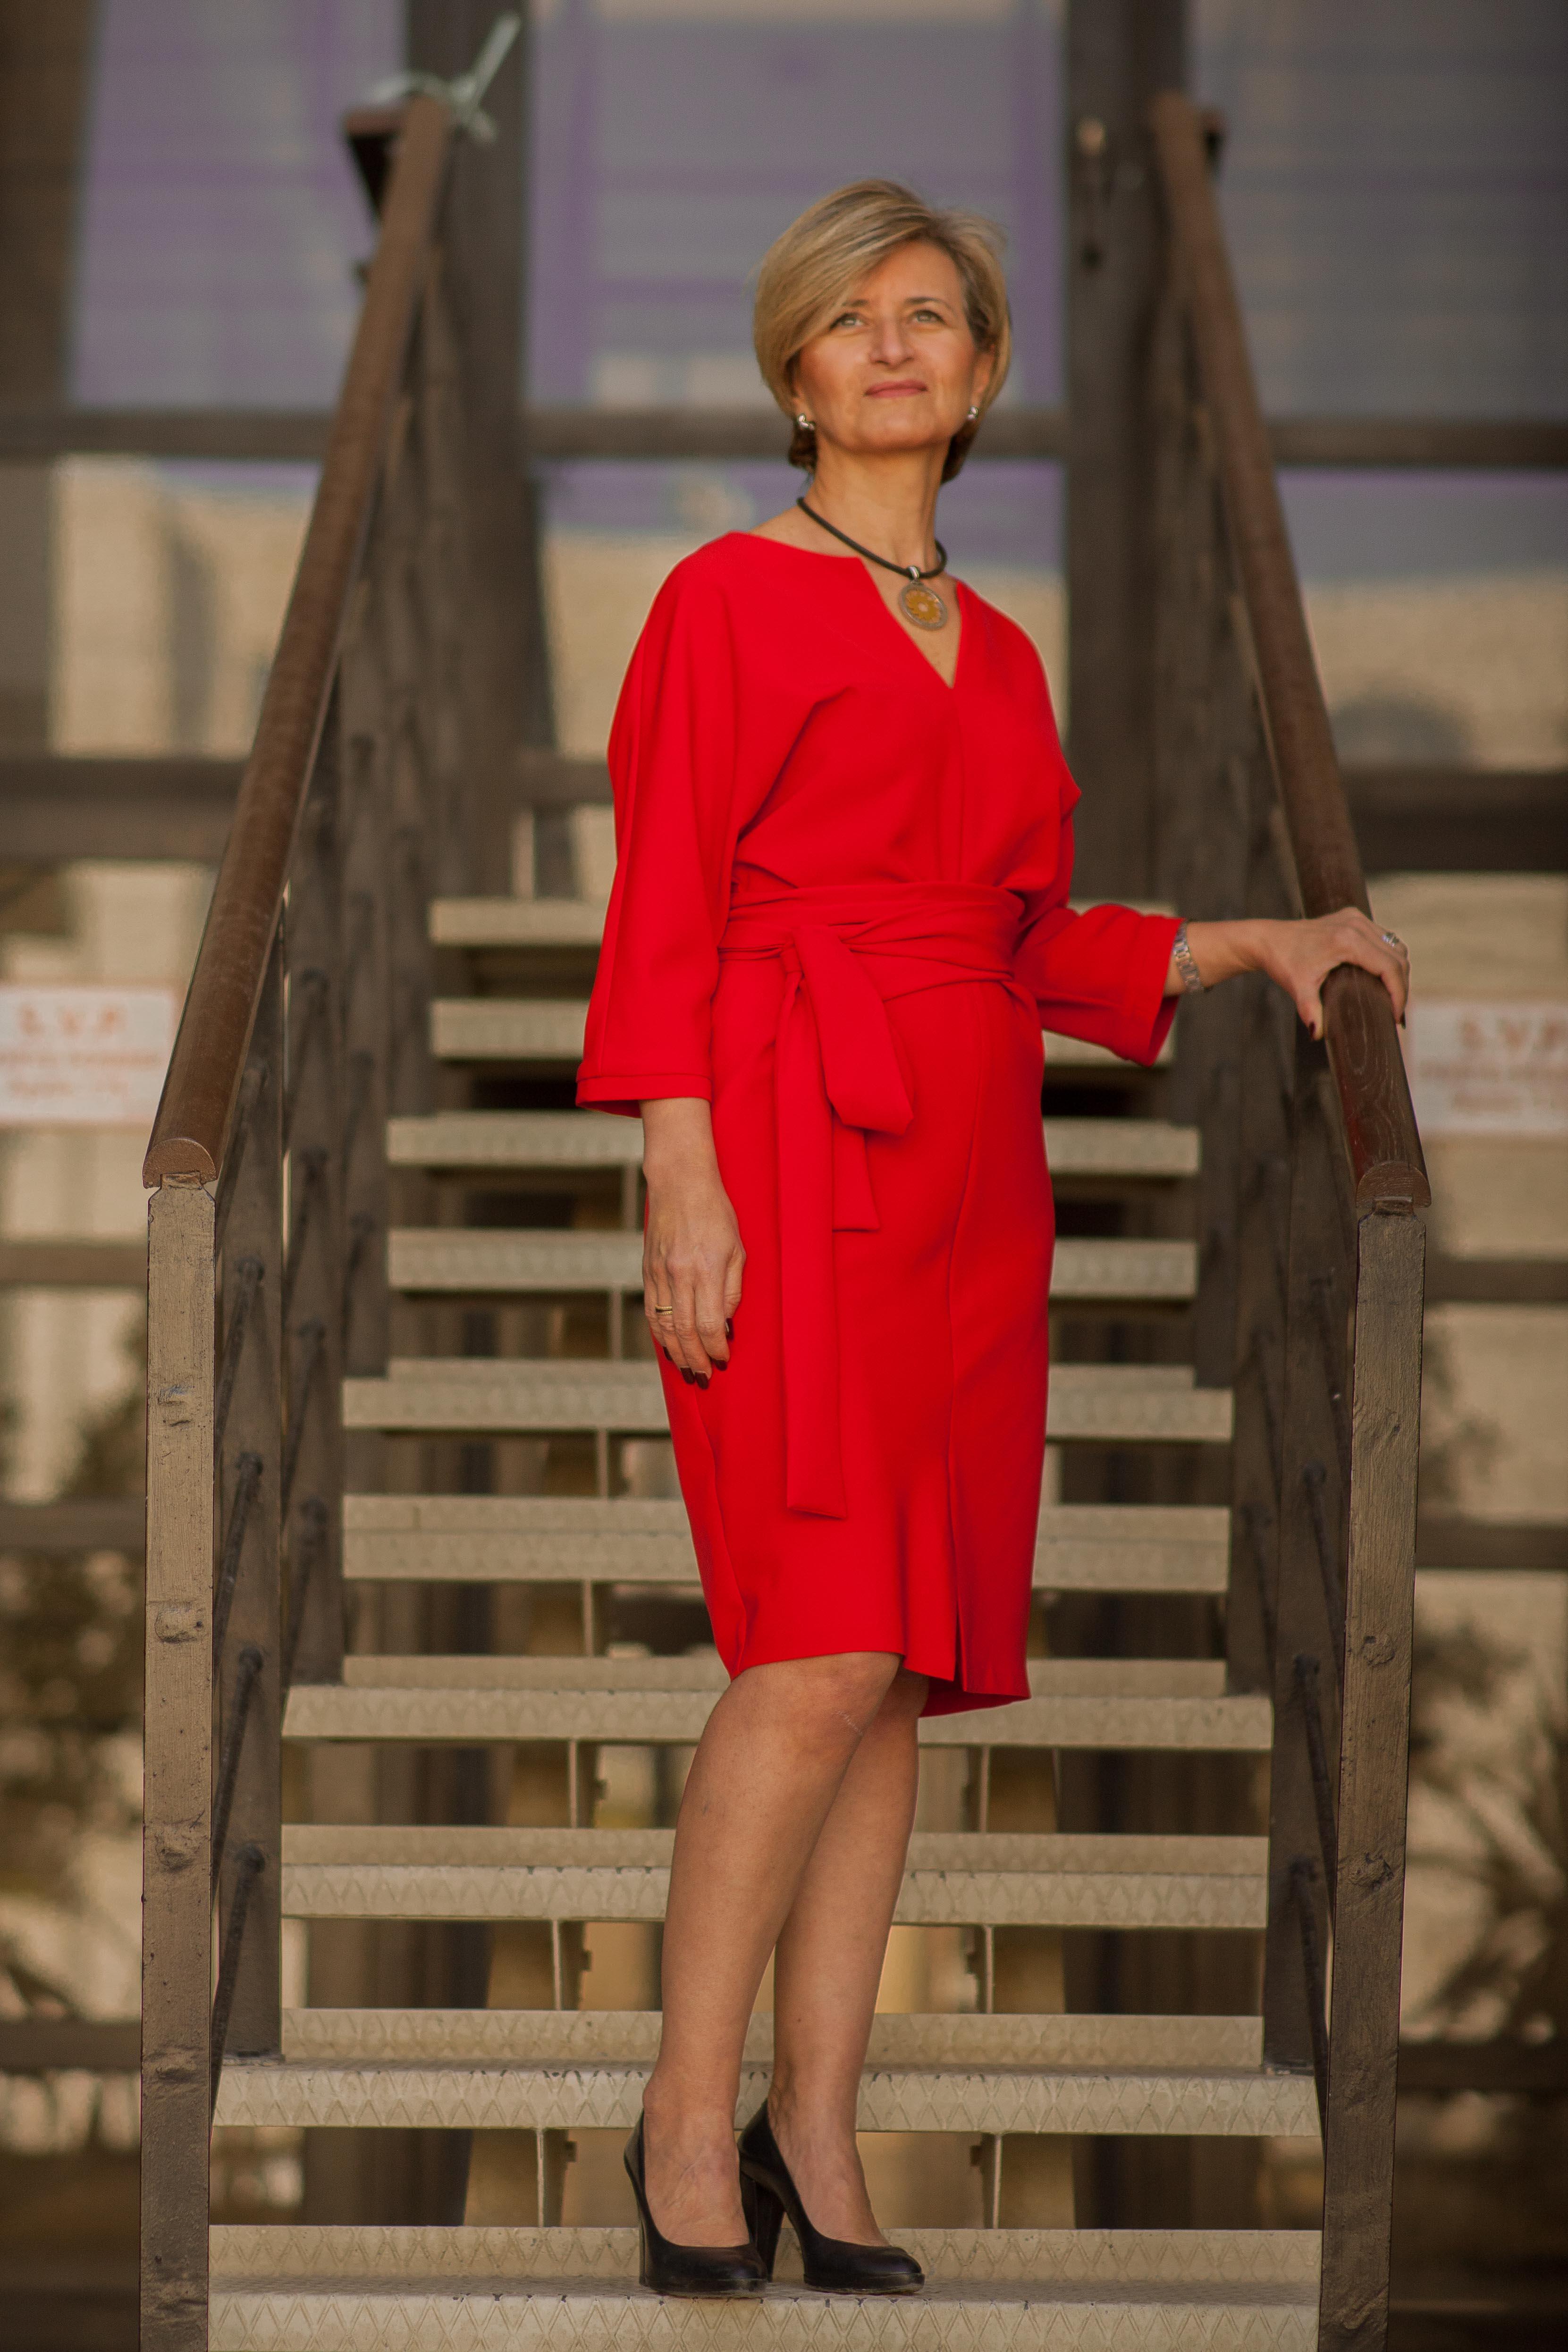 Ms. Shahrazède